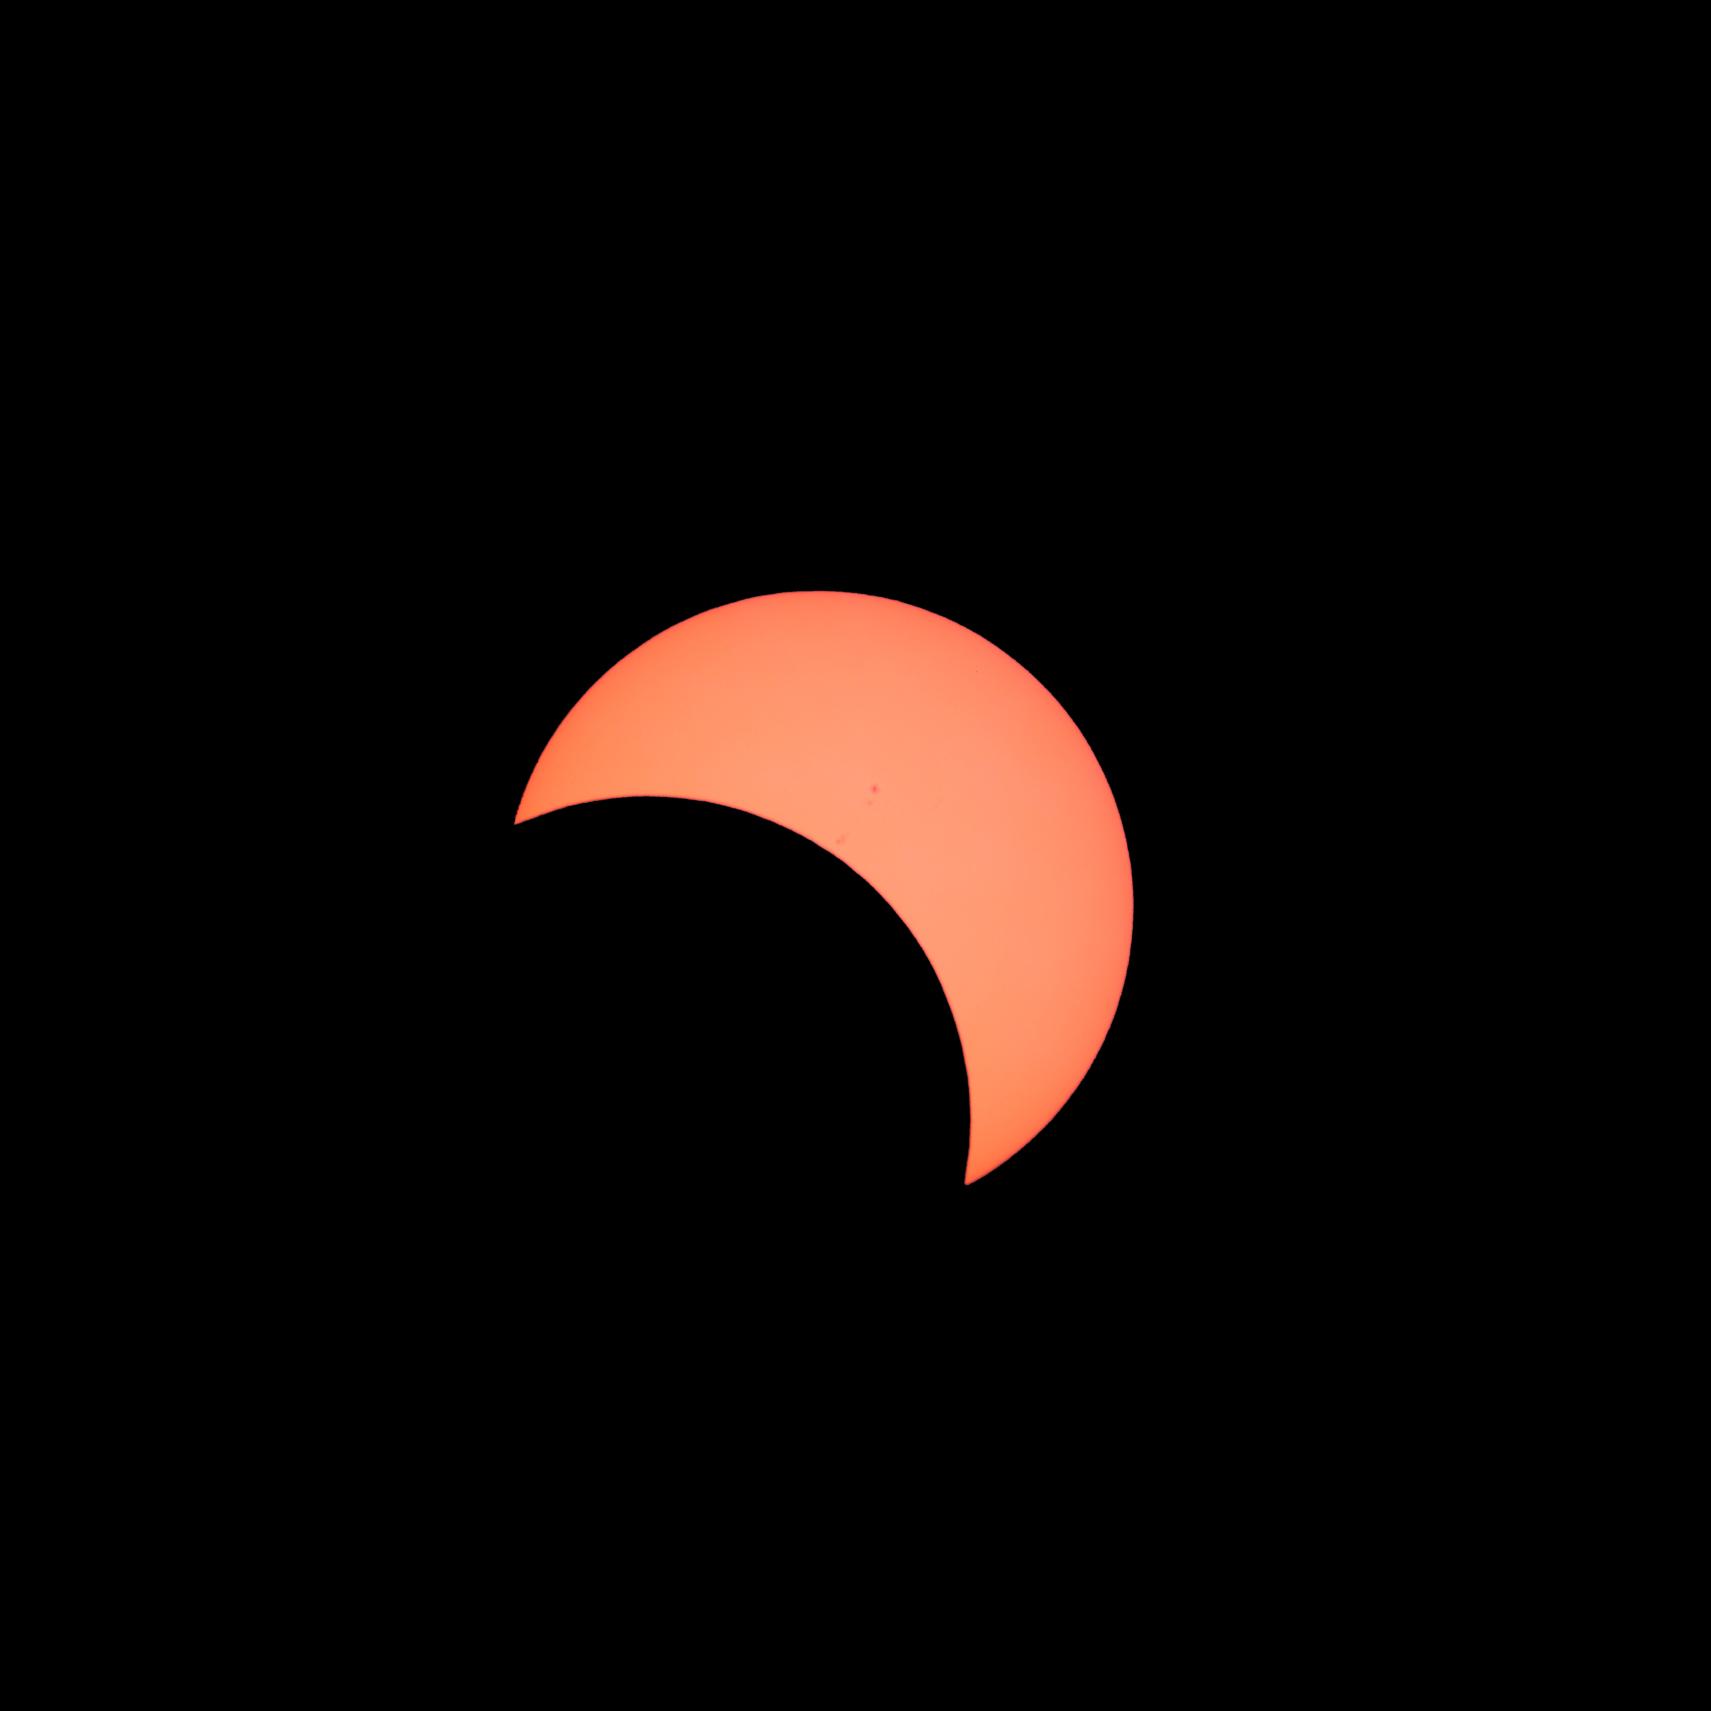 20170821_eclissi-parzialità-uscita-half_AlessandroDimai